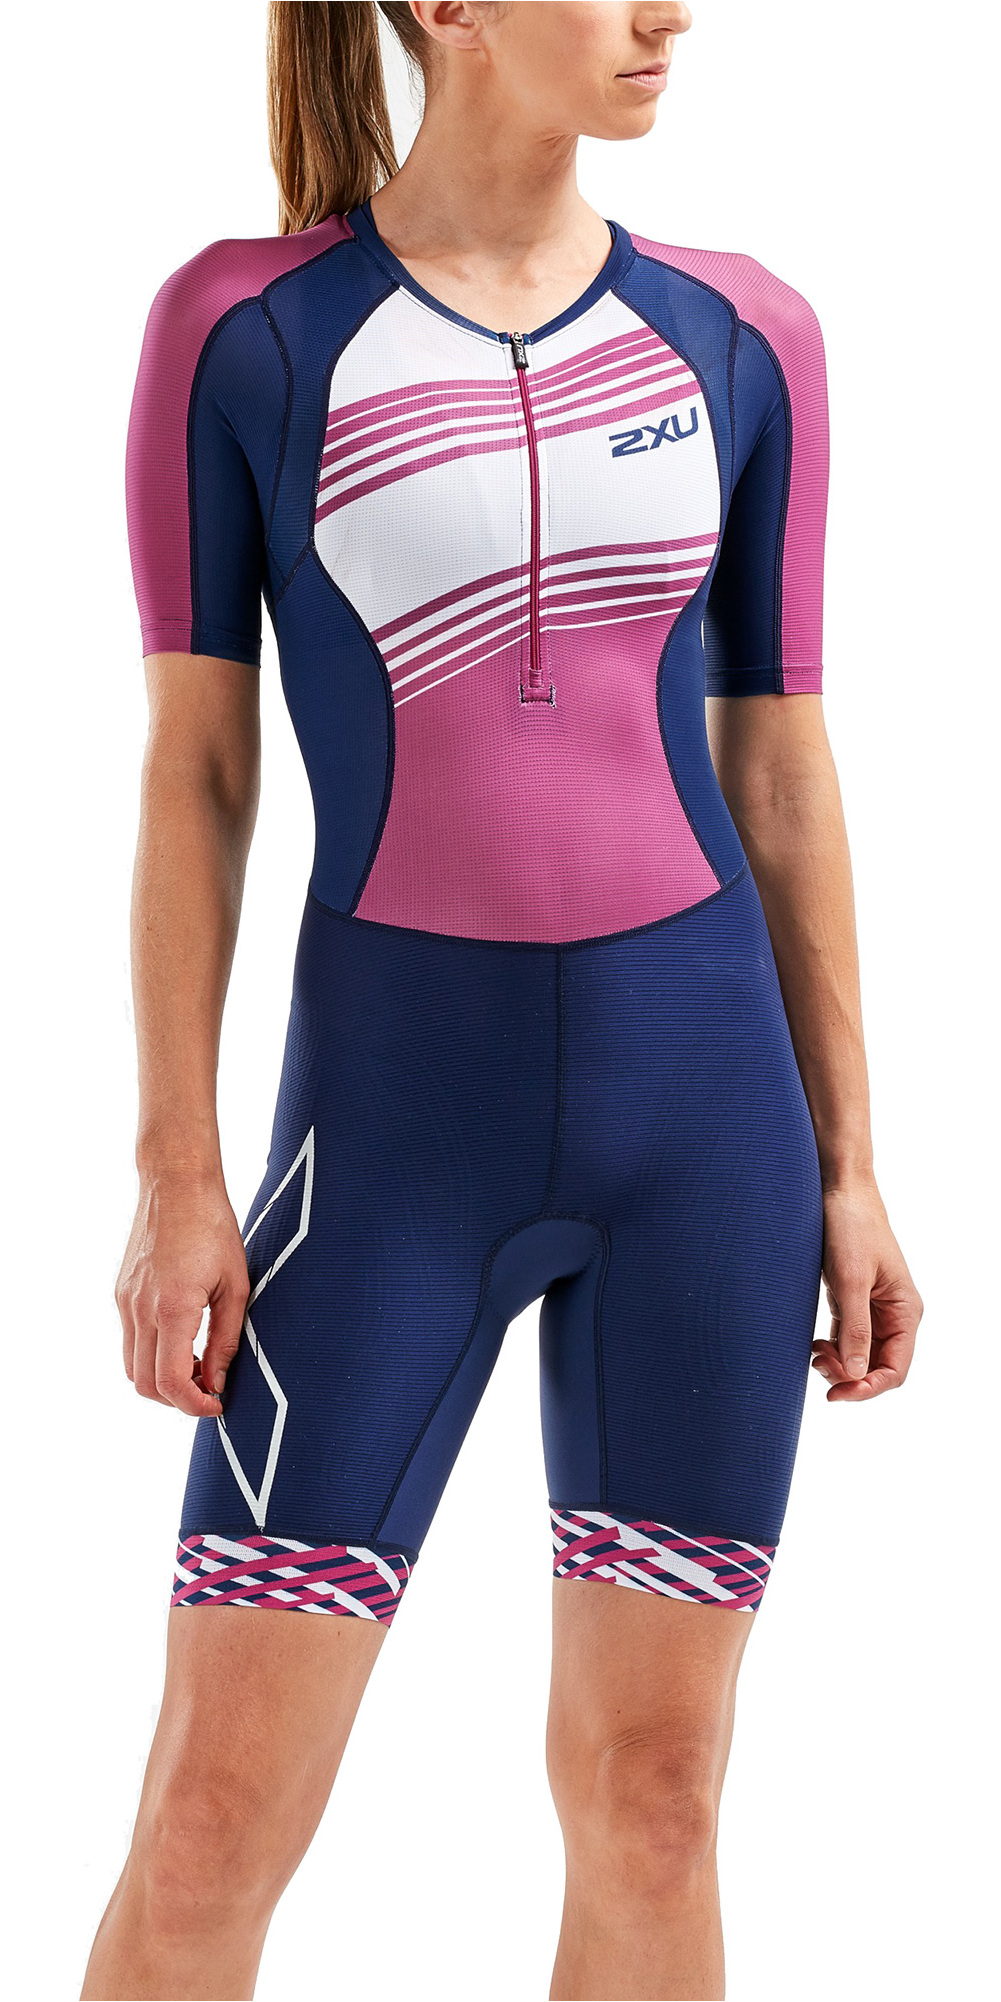 59c7c799f2c 2019 2XU Womens Compression Full Zip Short Sleeve Trisuit Navy Very Berry  Wt5521d - Triathlon | Wetsuit Outlet